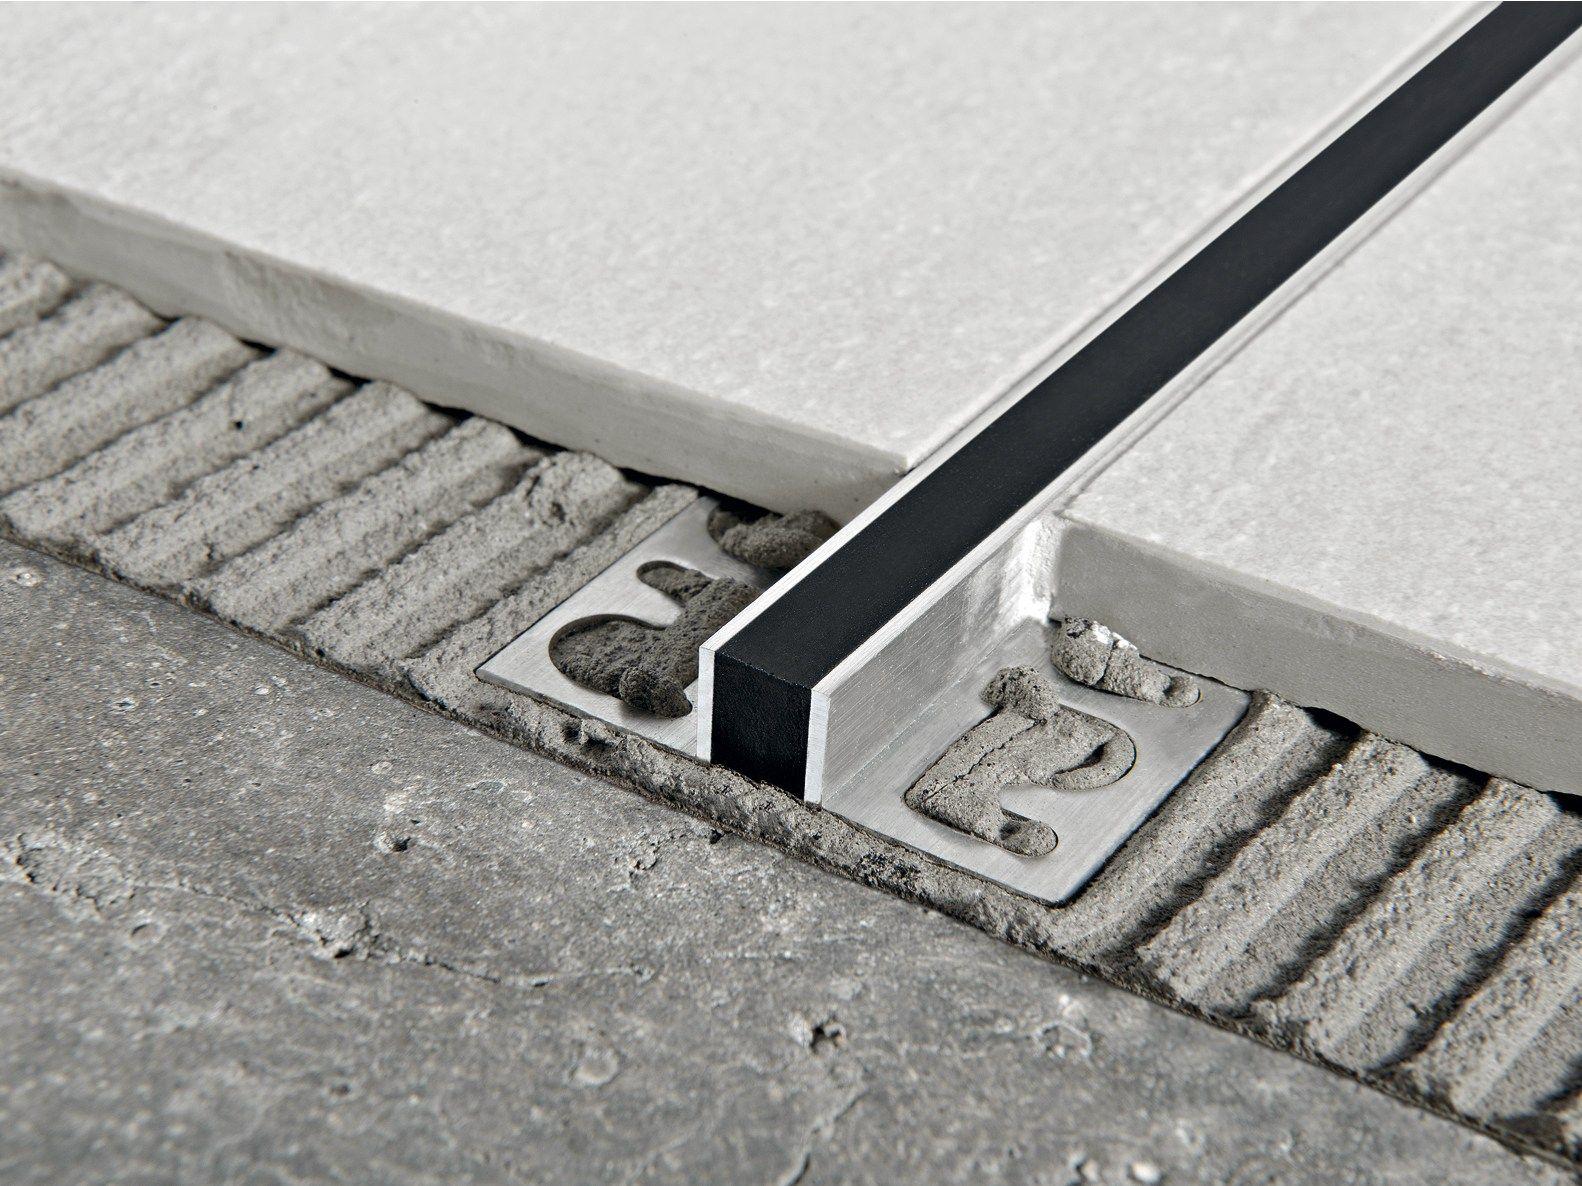 Neoprene Flooring Joint Prodilat By Progress Profiles Idees Pour La Maison Carrelage Sdb Revetement Mur